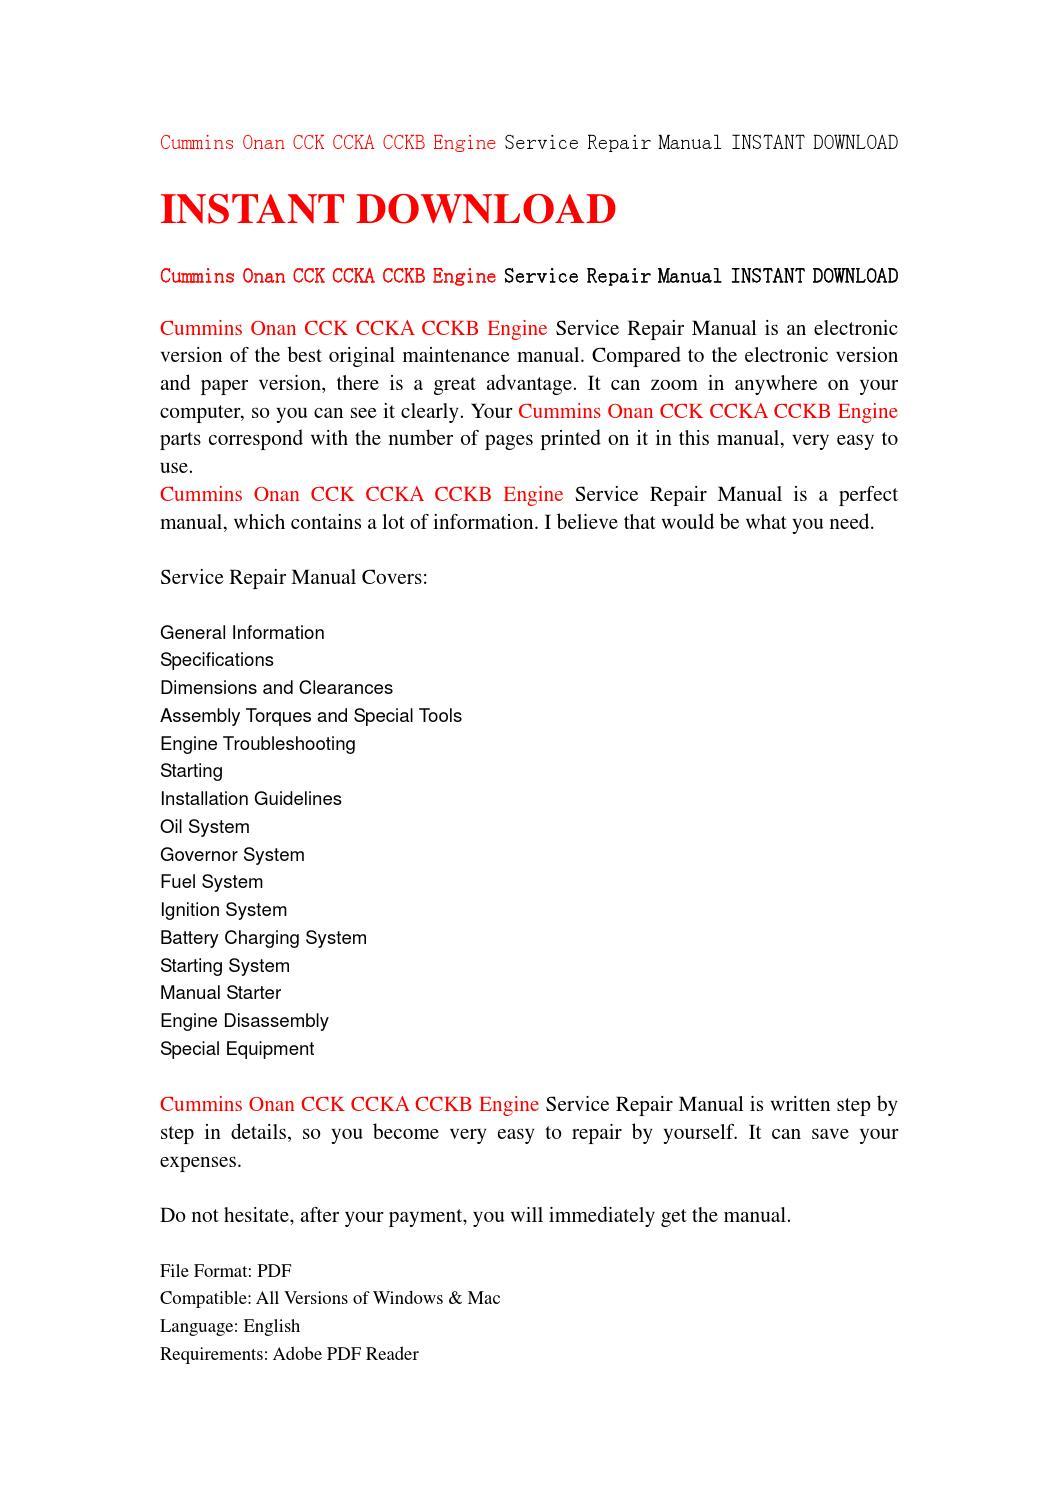 Cummins onan cck ccka cckb engine service repair manual instant download by  fksjmfse78 - issuu